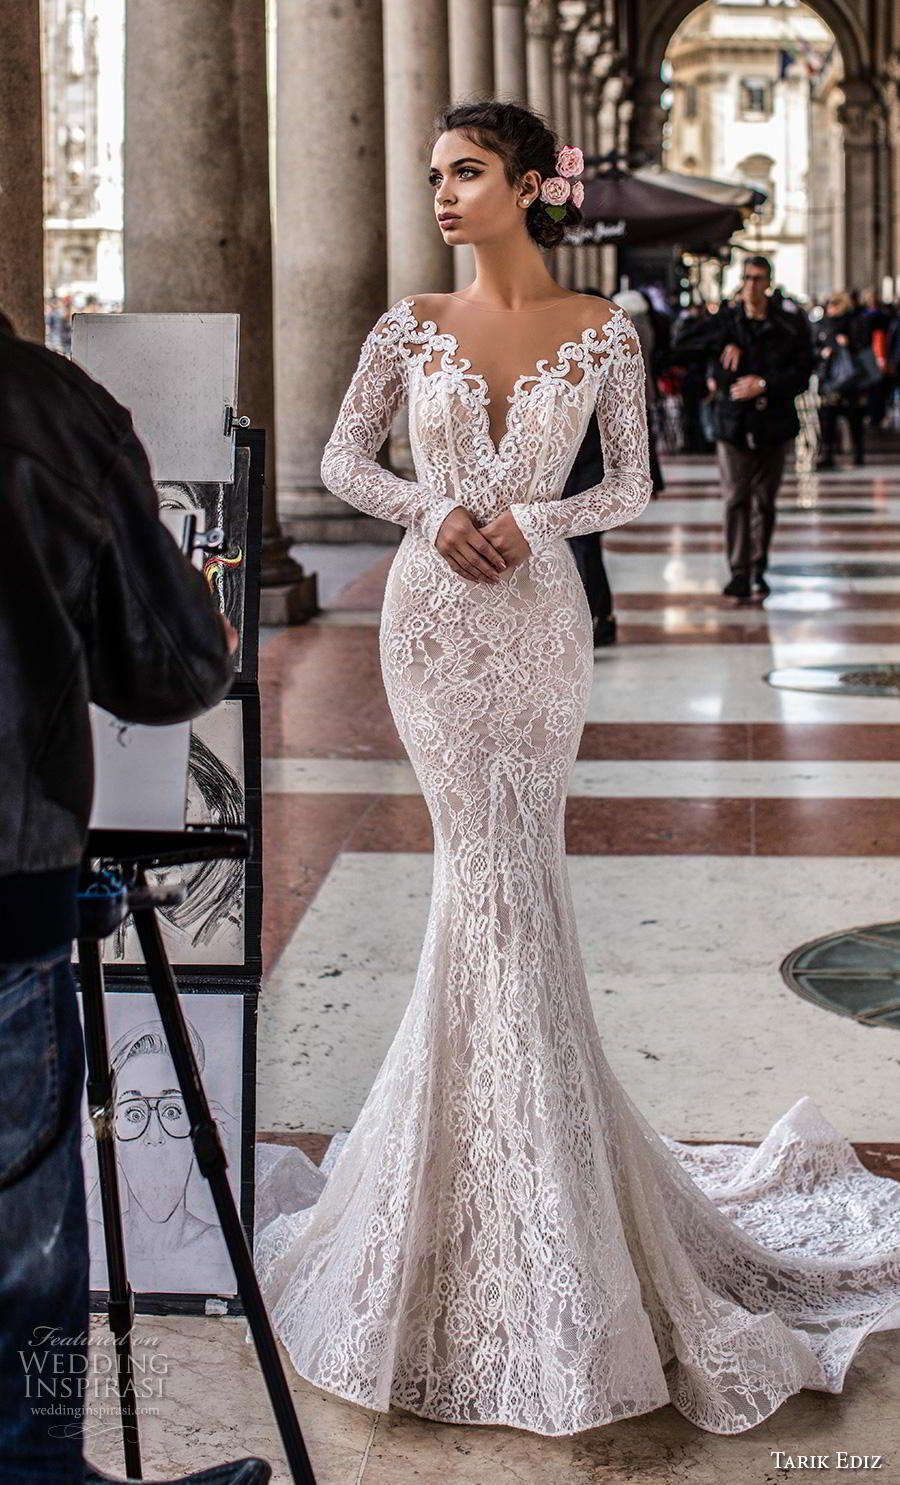 Tarik Ediz 2019 Wedding Dresses White Bridal Collection Wedding Inspirasi Lace Mermaid Wedding Dress Wedding Dress Long Sleeve Wedding Dresses